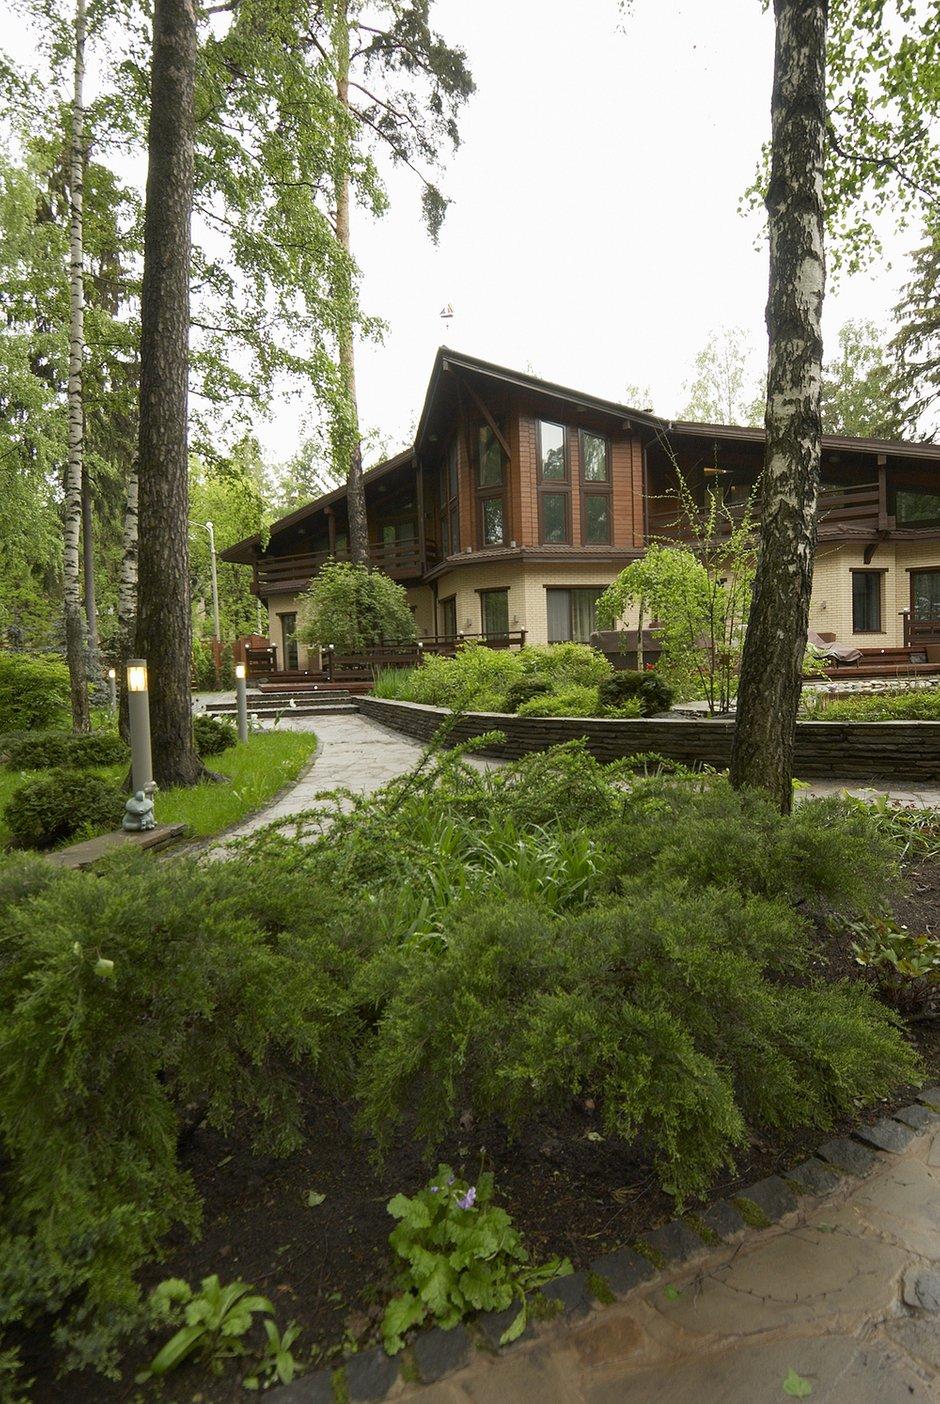 Фотография: Архитектура в стиле , Декор интерьера, Дом, Maitland Smith, Дома и квартиры – фото на INMYROOM